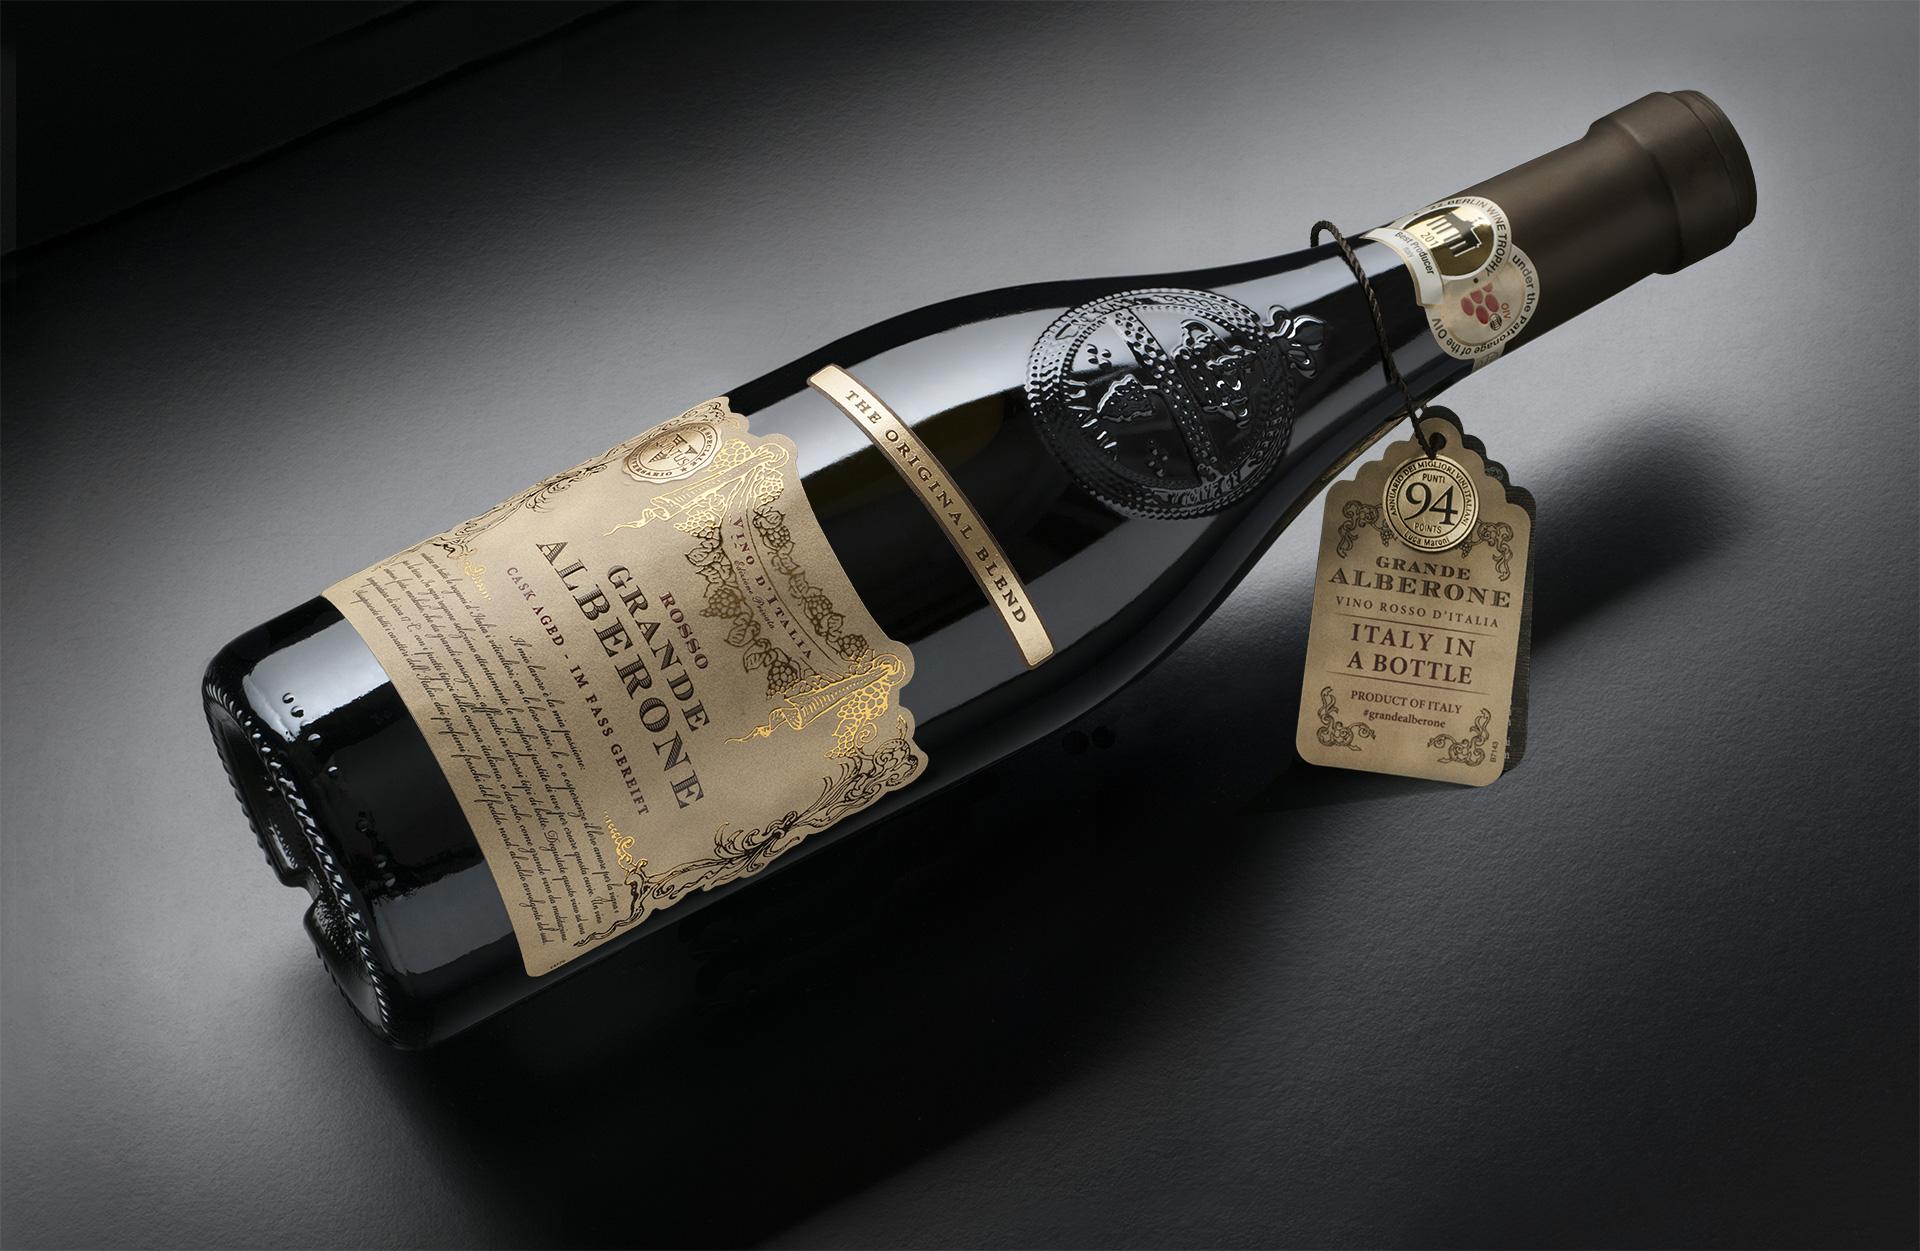 vino-grande-alberone-rosso-header-2_-12-07-2020-11-07-47.jpg